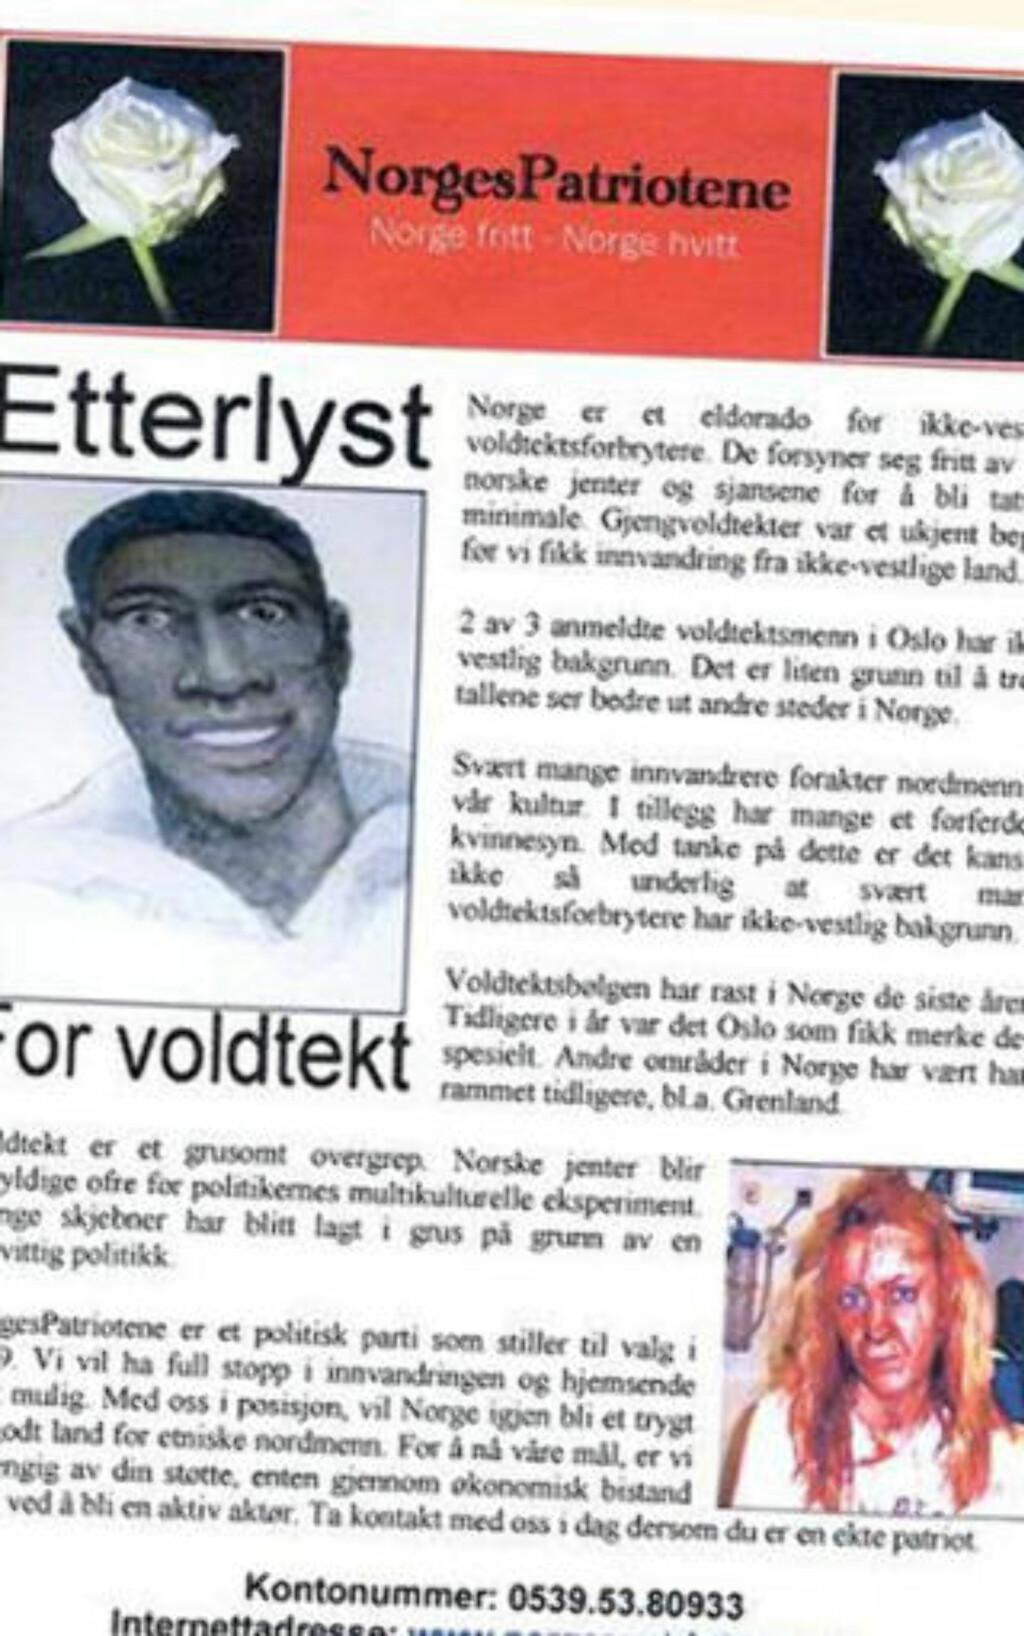 STERKE VIRKEMIDLER: NorgesPatriotene har flere ganger skapt sterke reaksjoner med sine løpeseddelkampanjer, som denne, der de hevder at «Norge er et eldorado for ikke-vestlige voldtektsforbrytere». Faksimile: NORGESPATRIOTENE